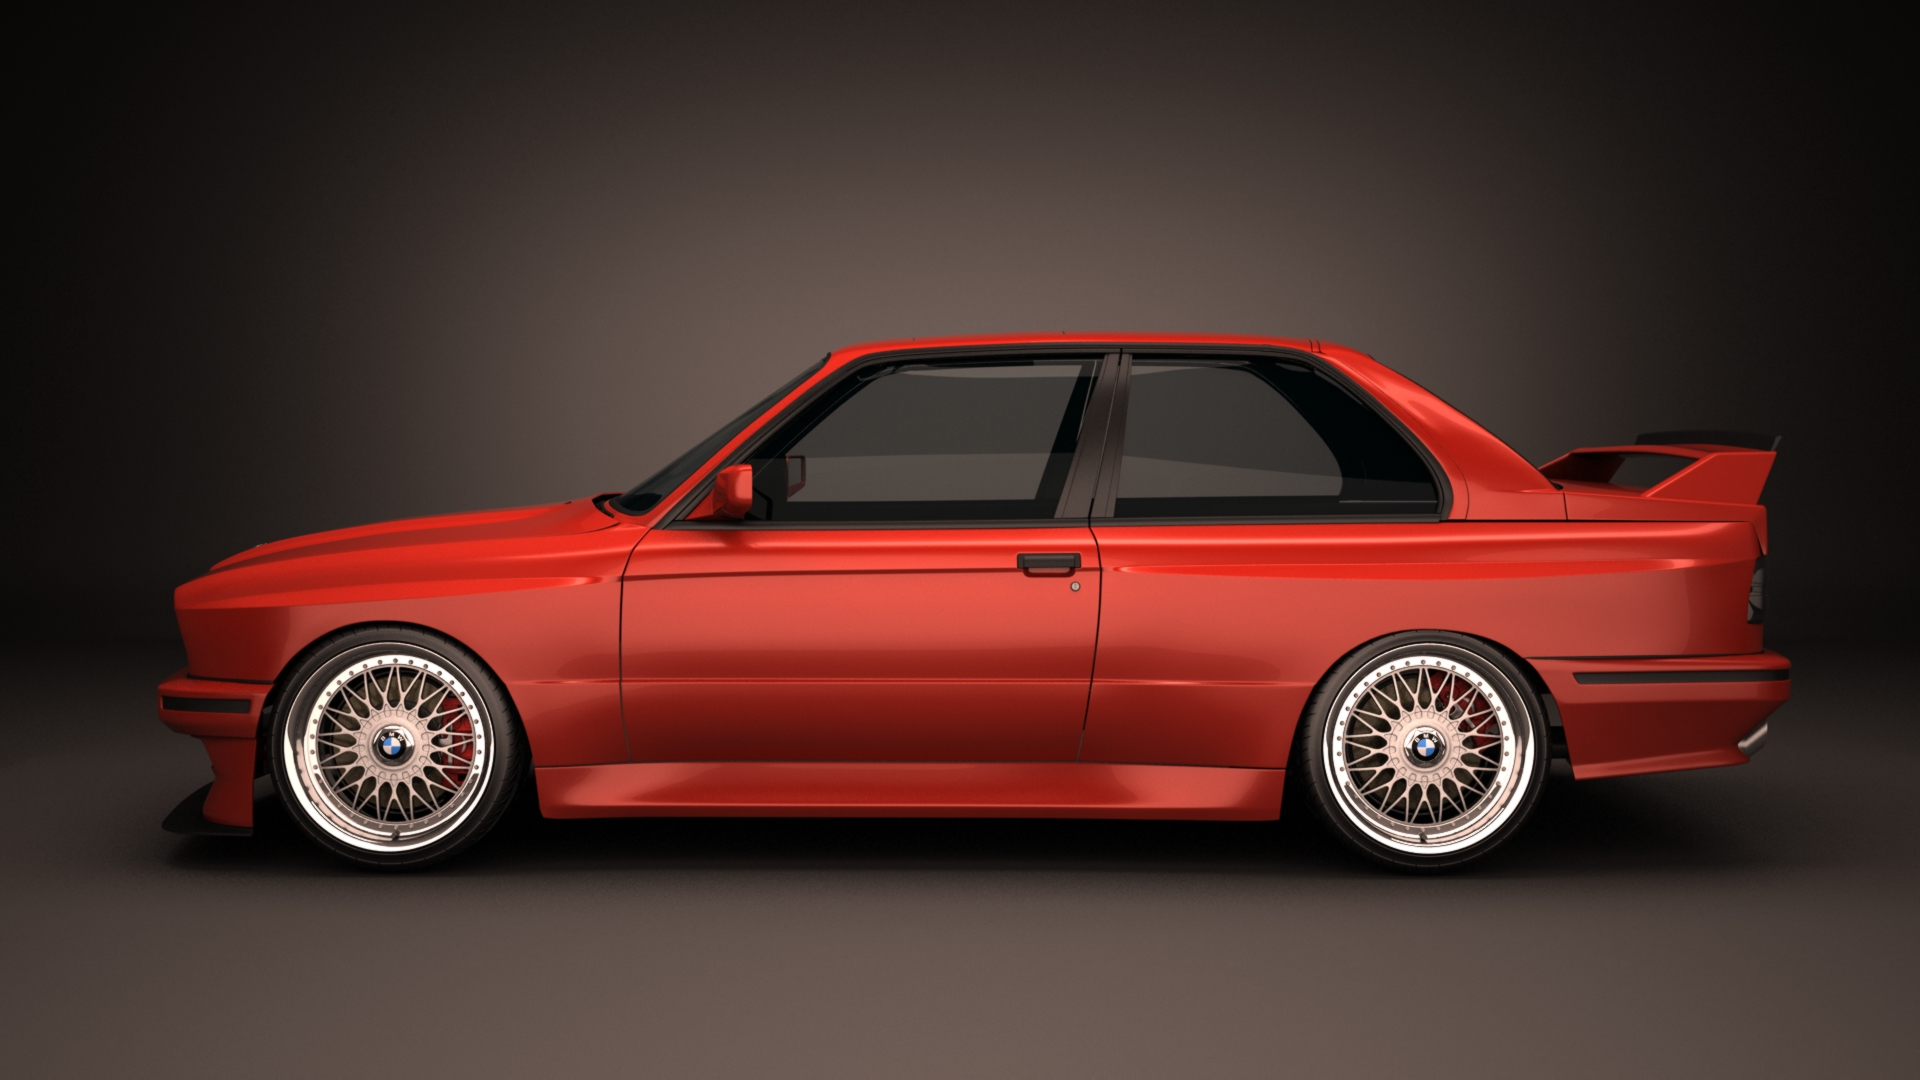 BMW e30 M3 WIP update 5 | Dav3design's Blog